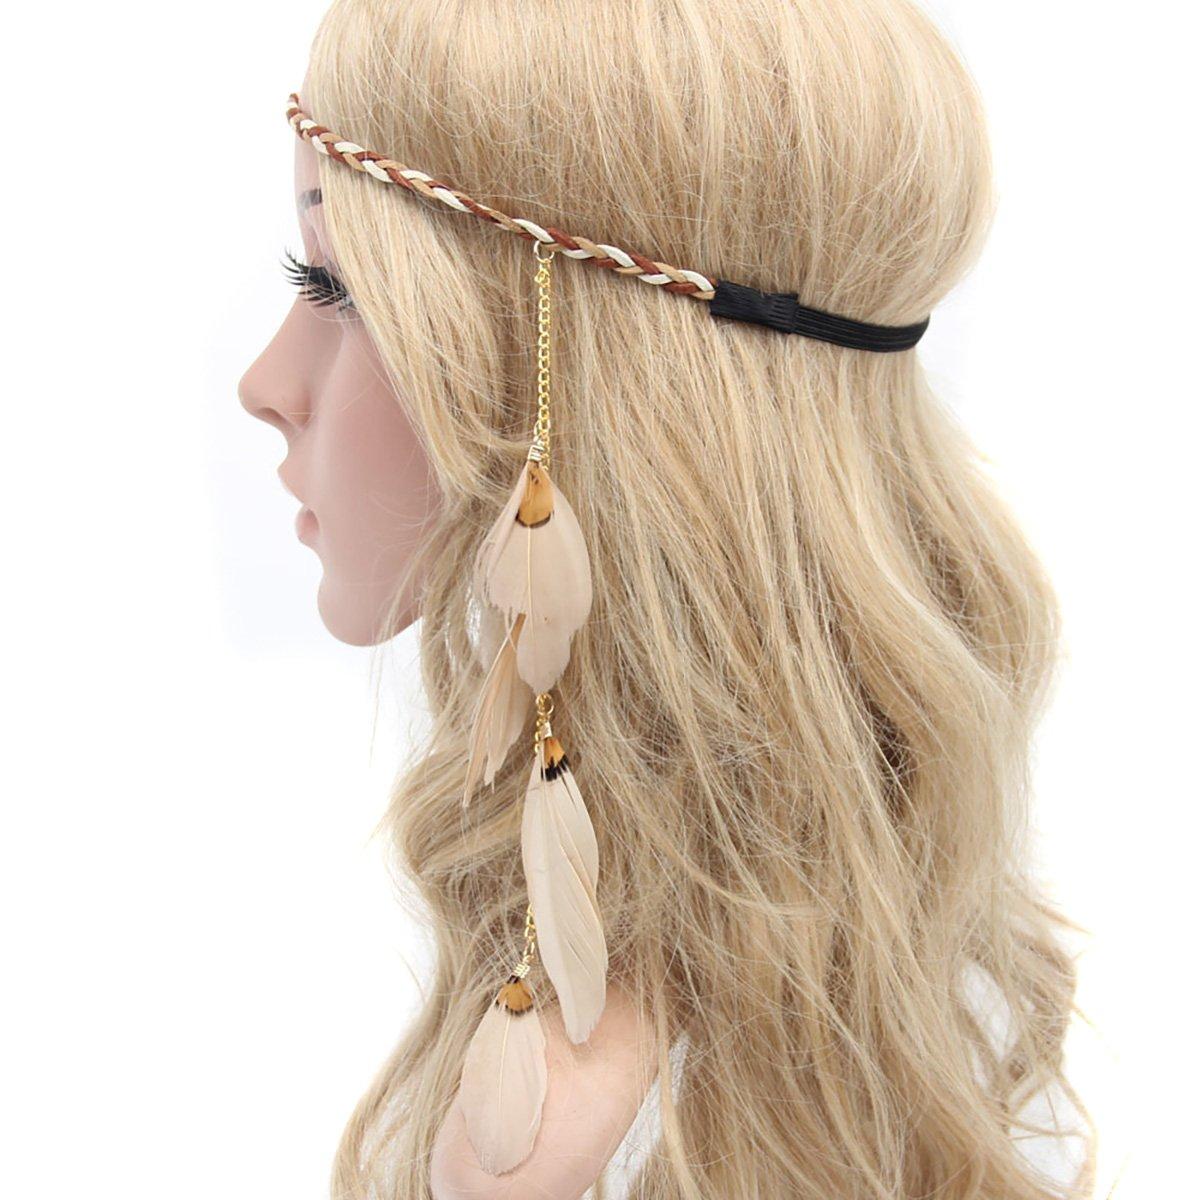 Hippie Costumes, Hippie Outfits Fodattm Women Lady Bohemian Tassels Hairband Headwear Hippie Feather Headband Hair Hoop Handmade Indian Fascinator Headband Hair Bands Headdress Hair Accessories (A#) $7.38 AT vintagedancer.com